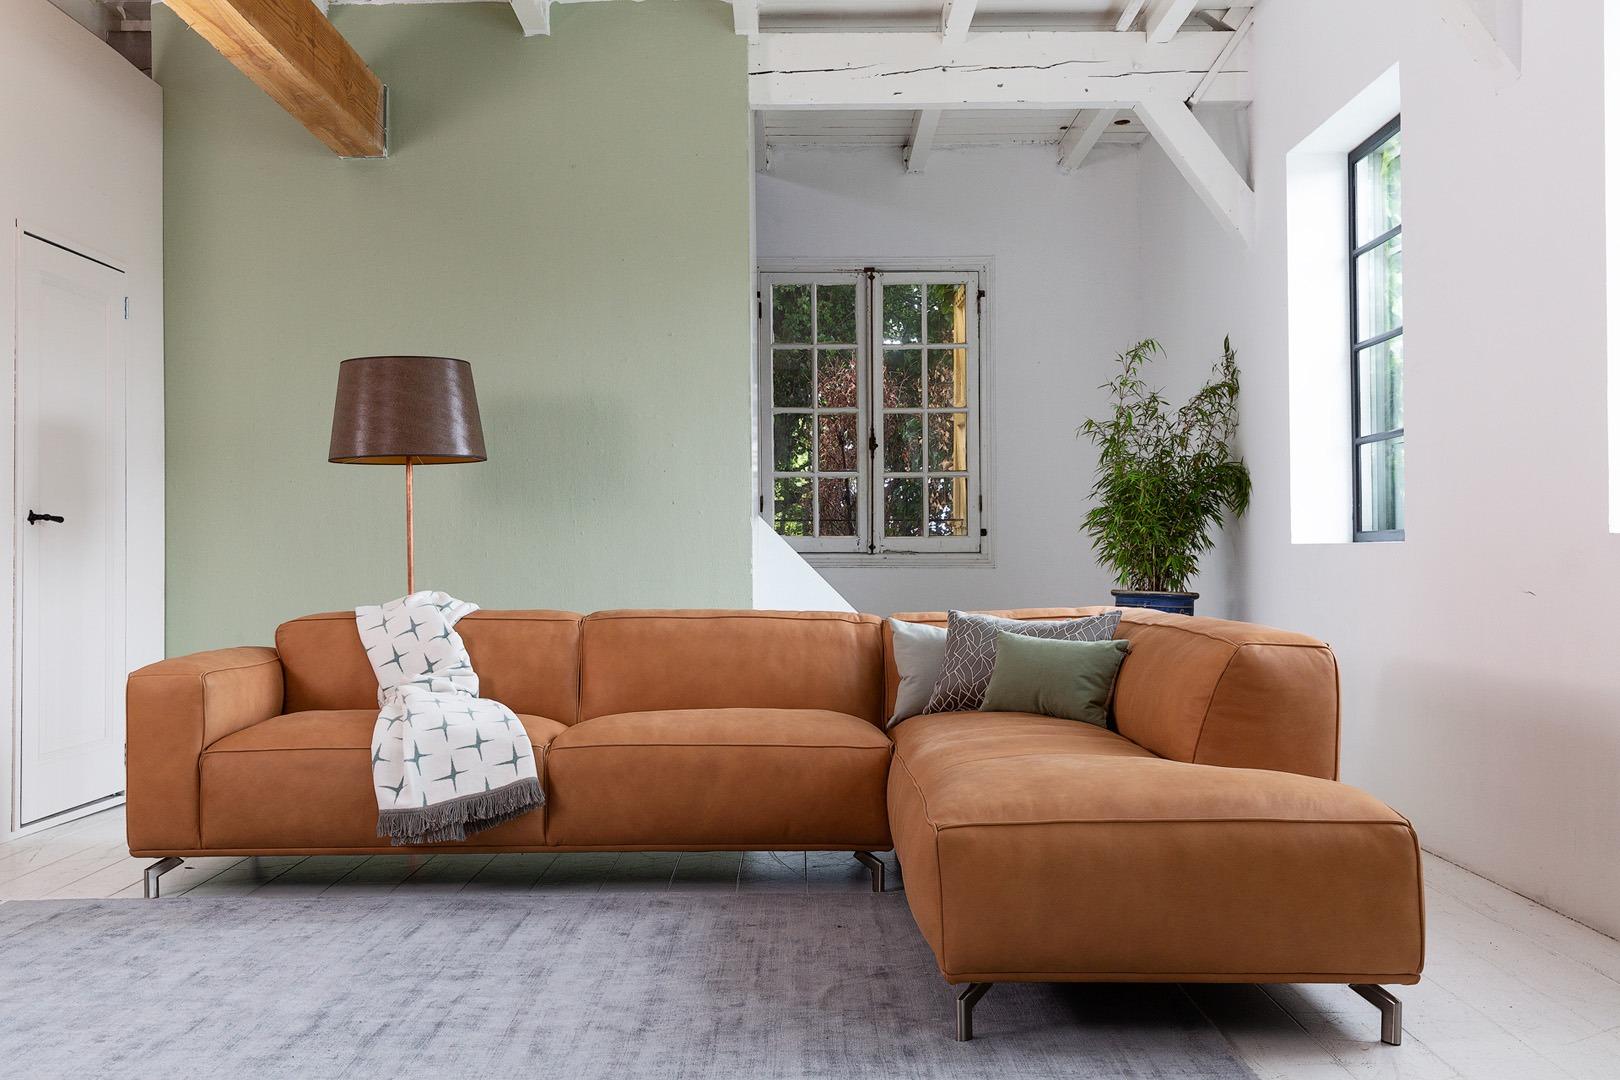 chill-ibiza-congac-leer-ottoman-hoekbank-soofs-interieur (1)